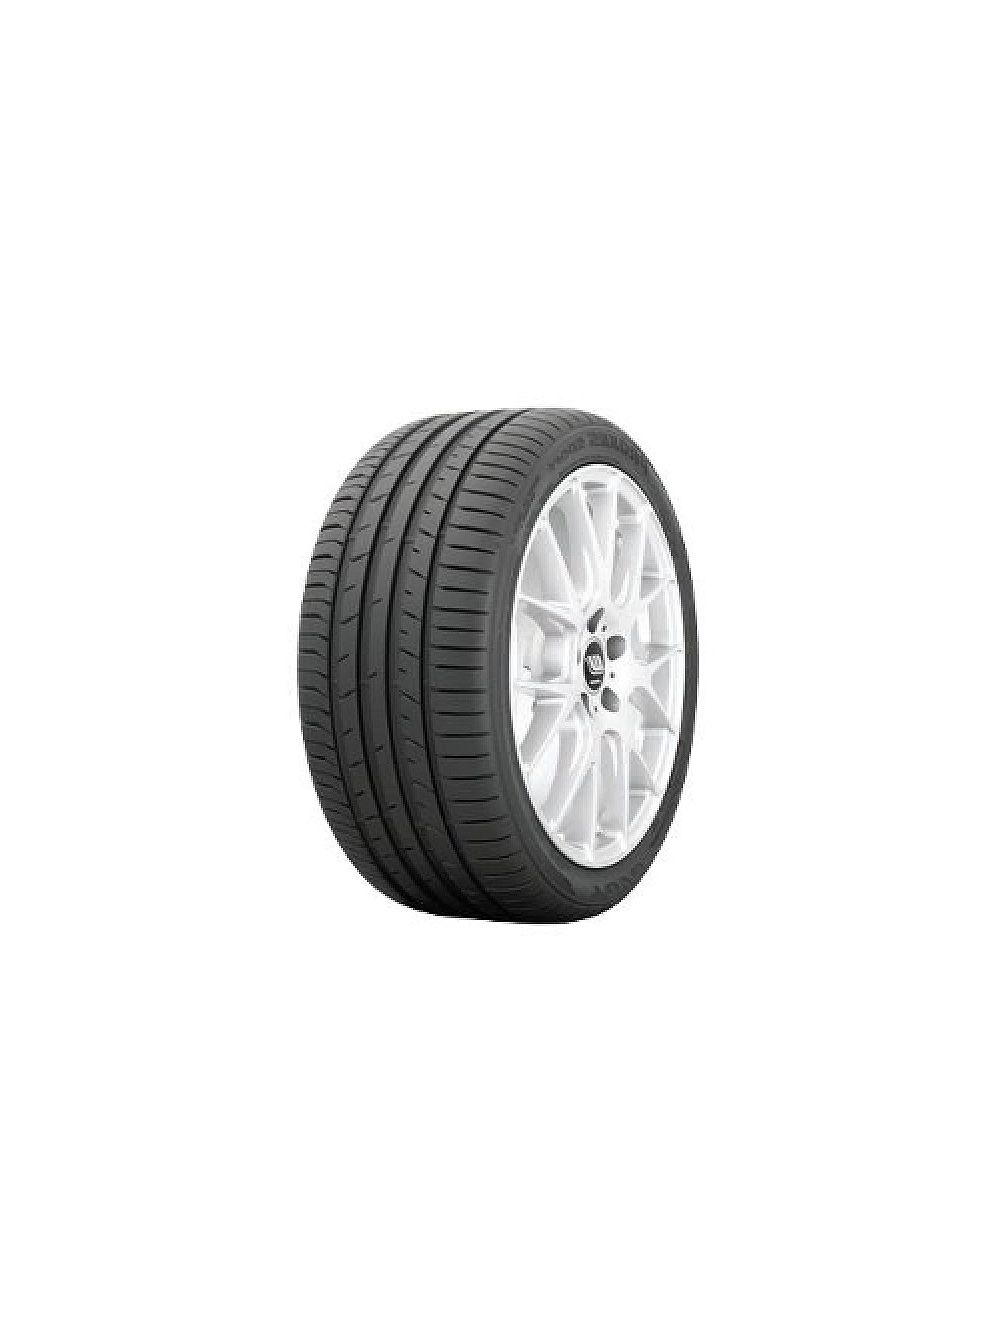 Toyo 265/35R20 Y Proxes Sport XL Nyári gumi